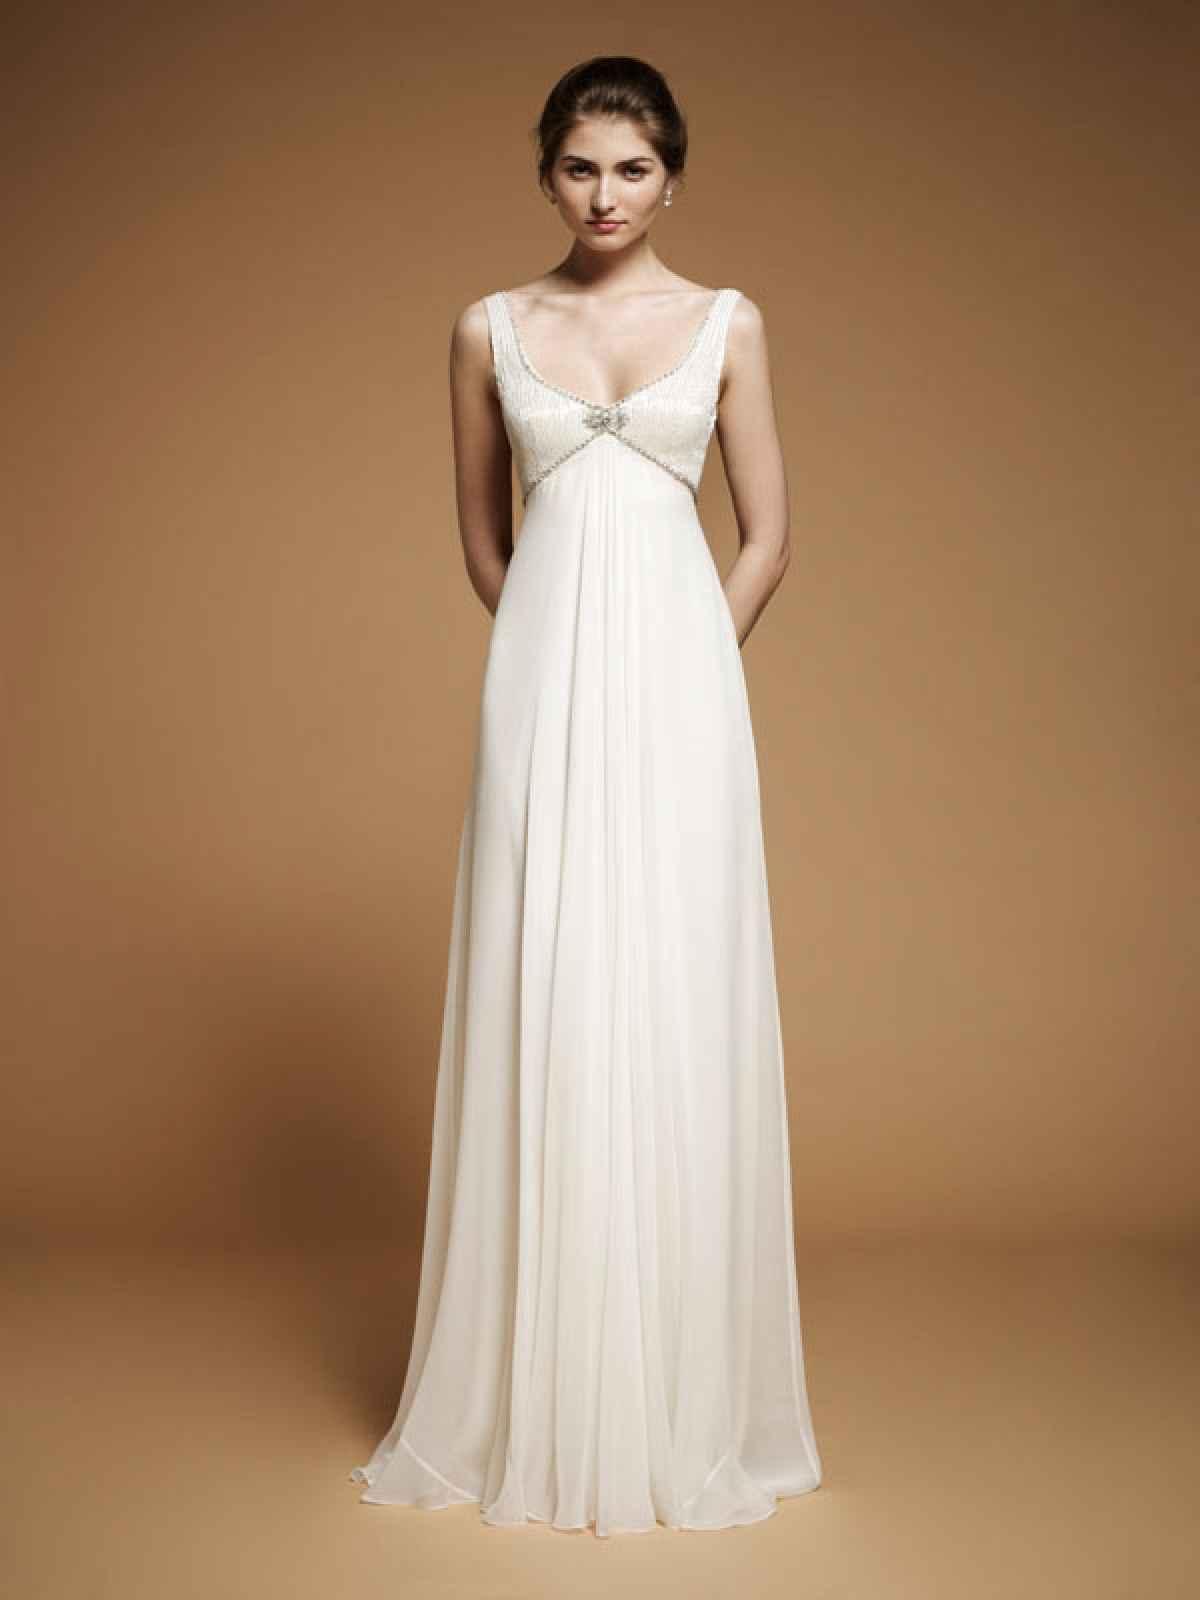 Wedding dresses for women over 40 cocktail dresses 2016 for Wedding dress for women